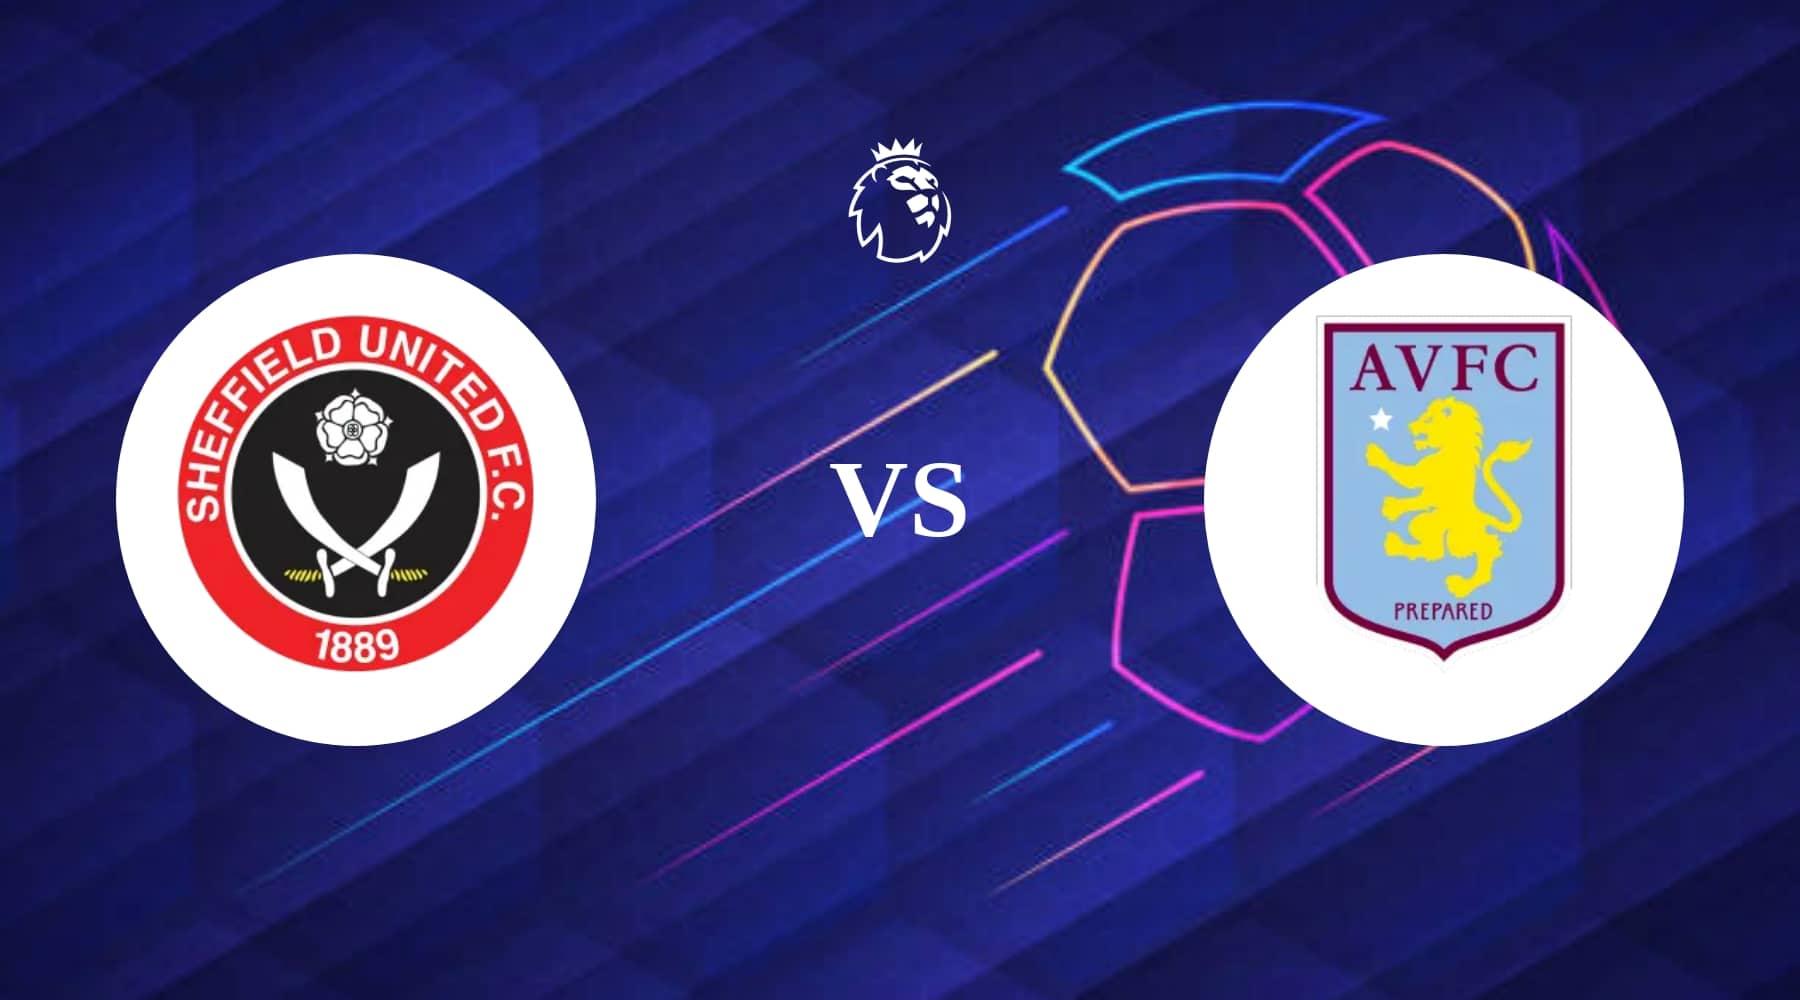 Sheffield United vs Aston Villa